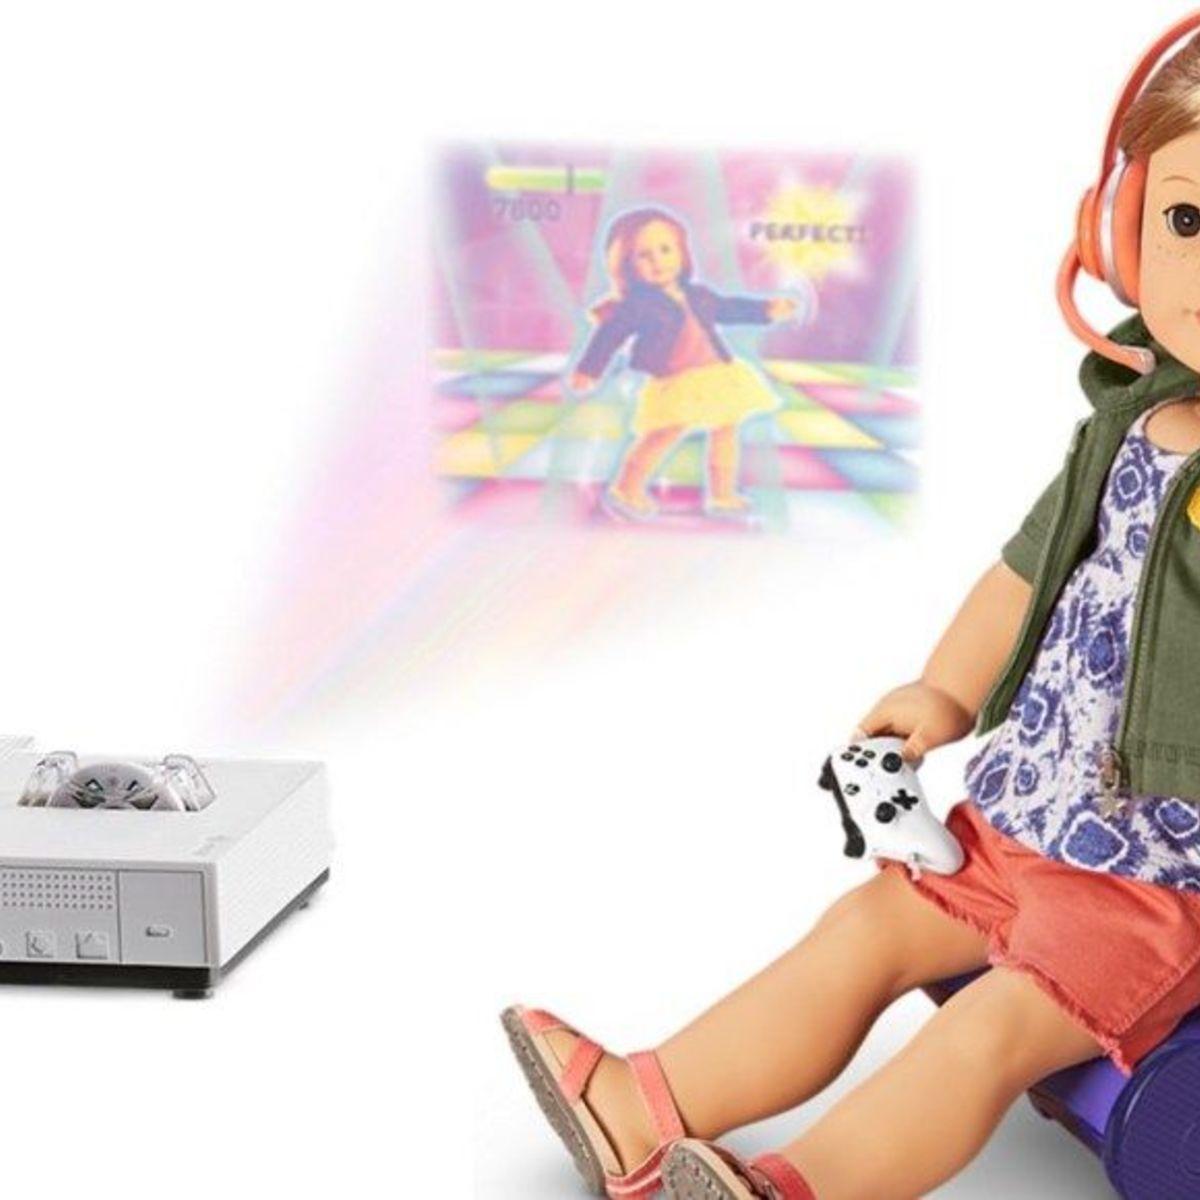 American Girl - Xbox Doll Image